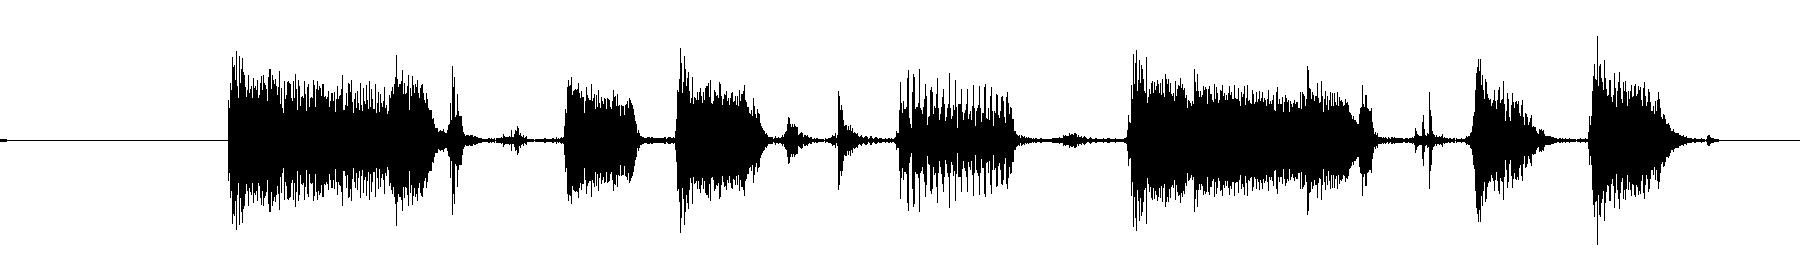 guitarblues06 130